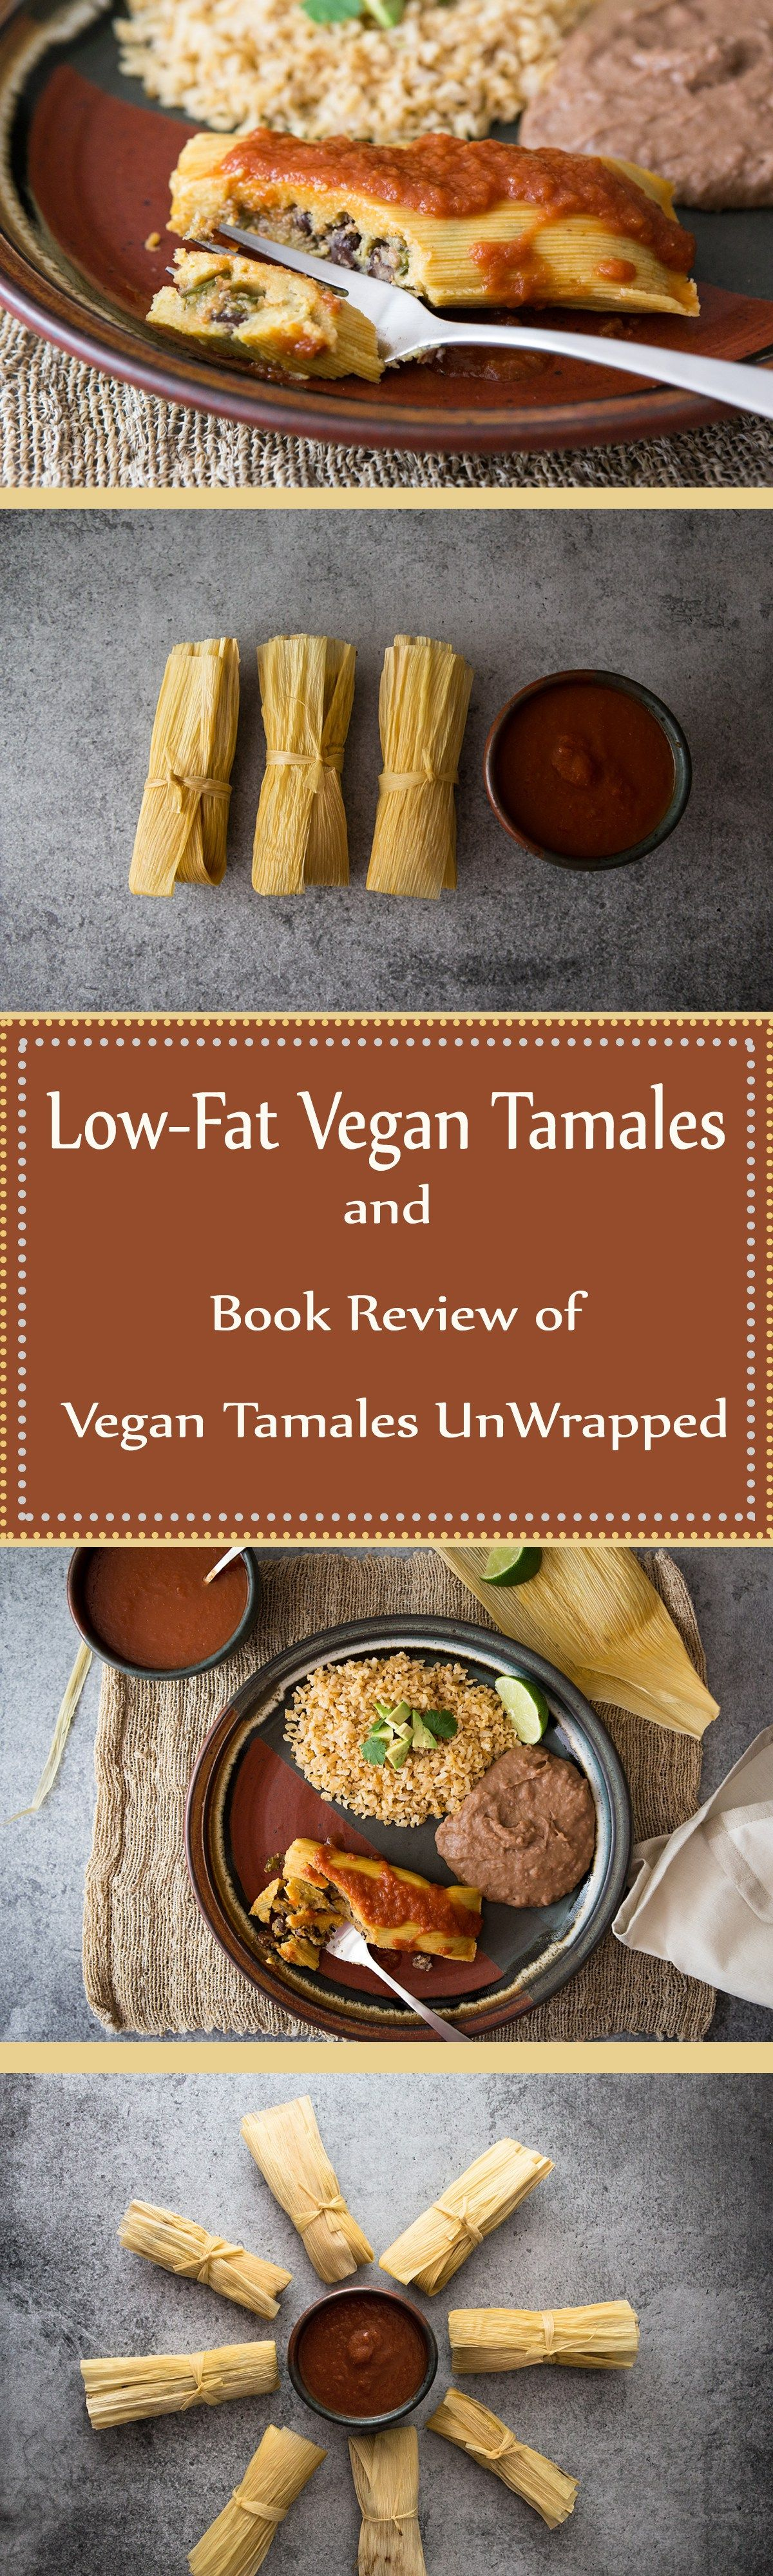 Zucchini Black Tamales